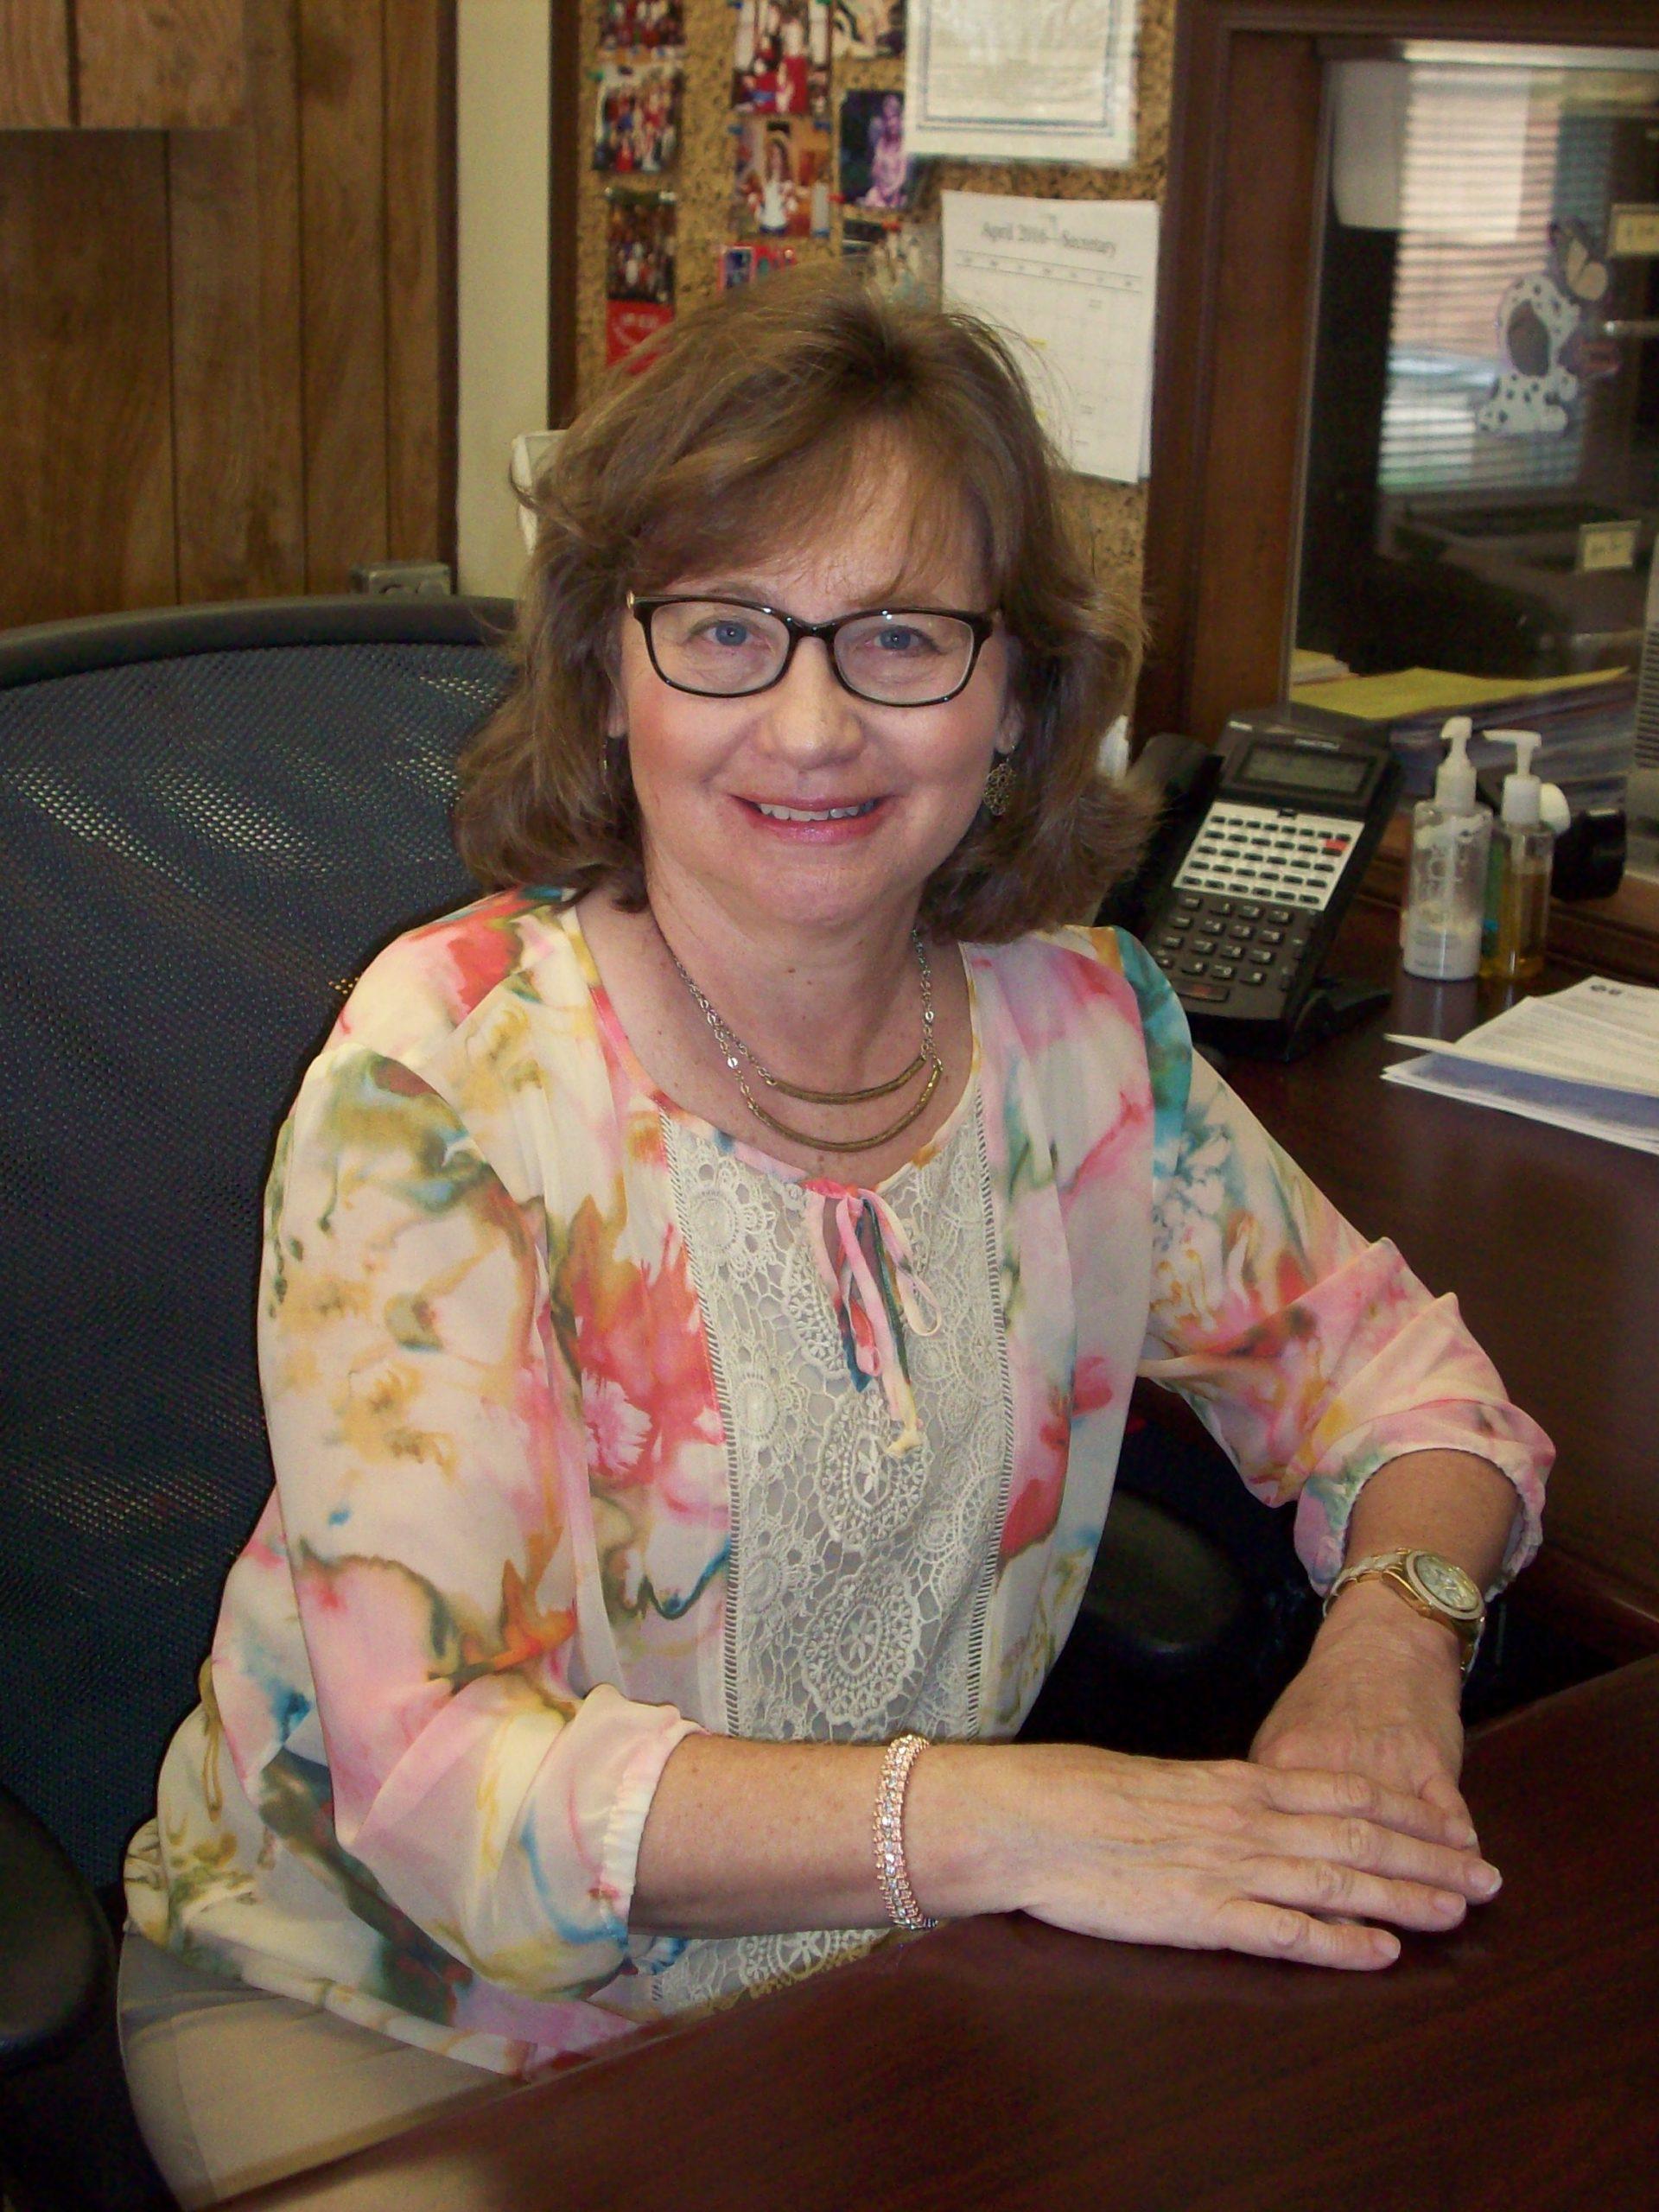 Carol Foersterling